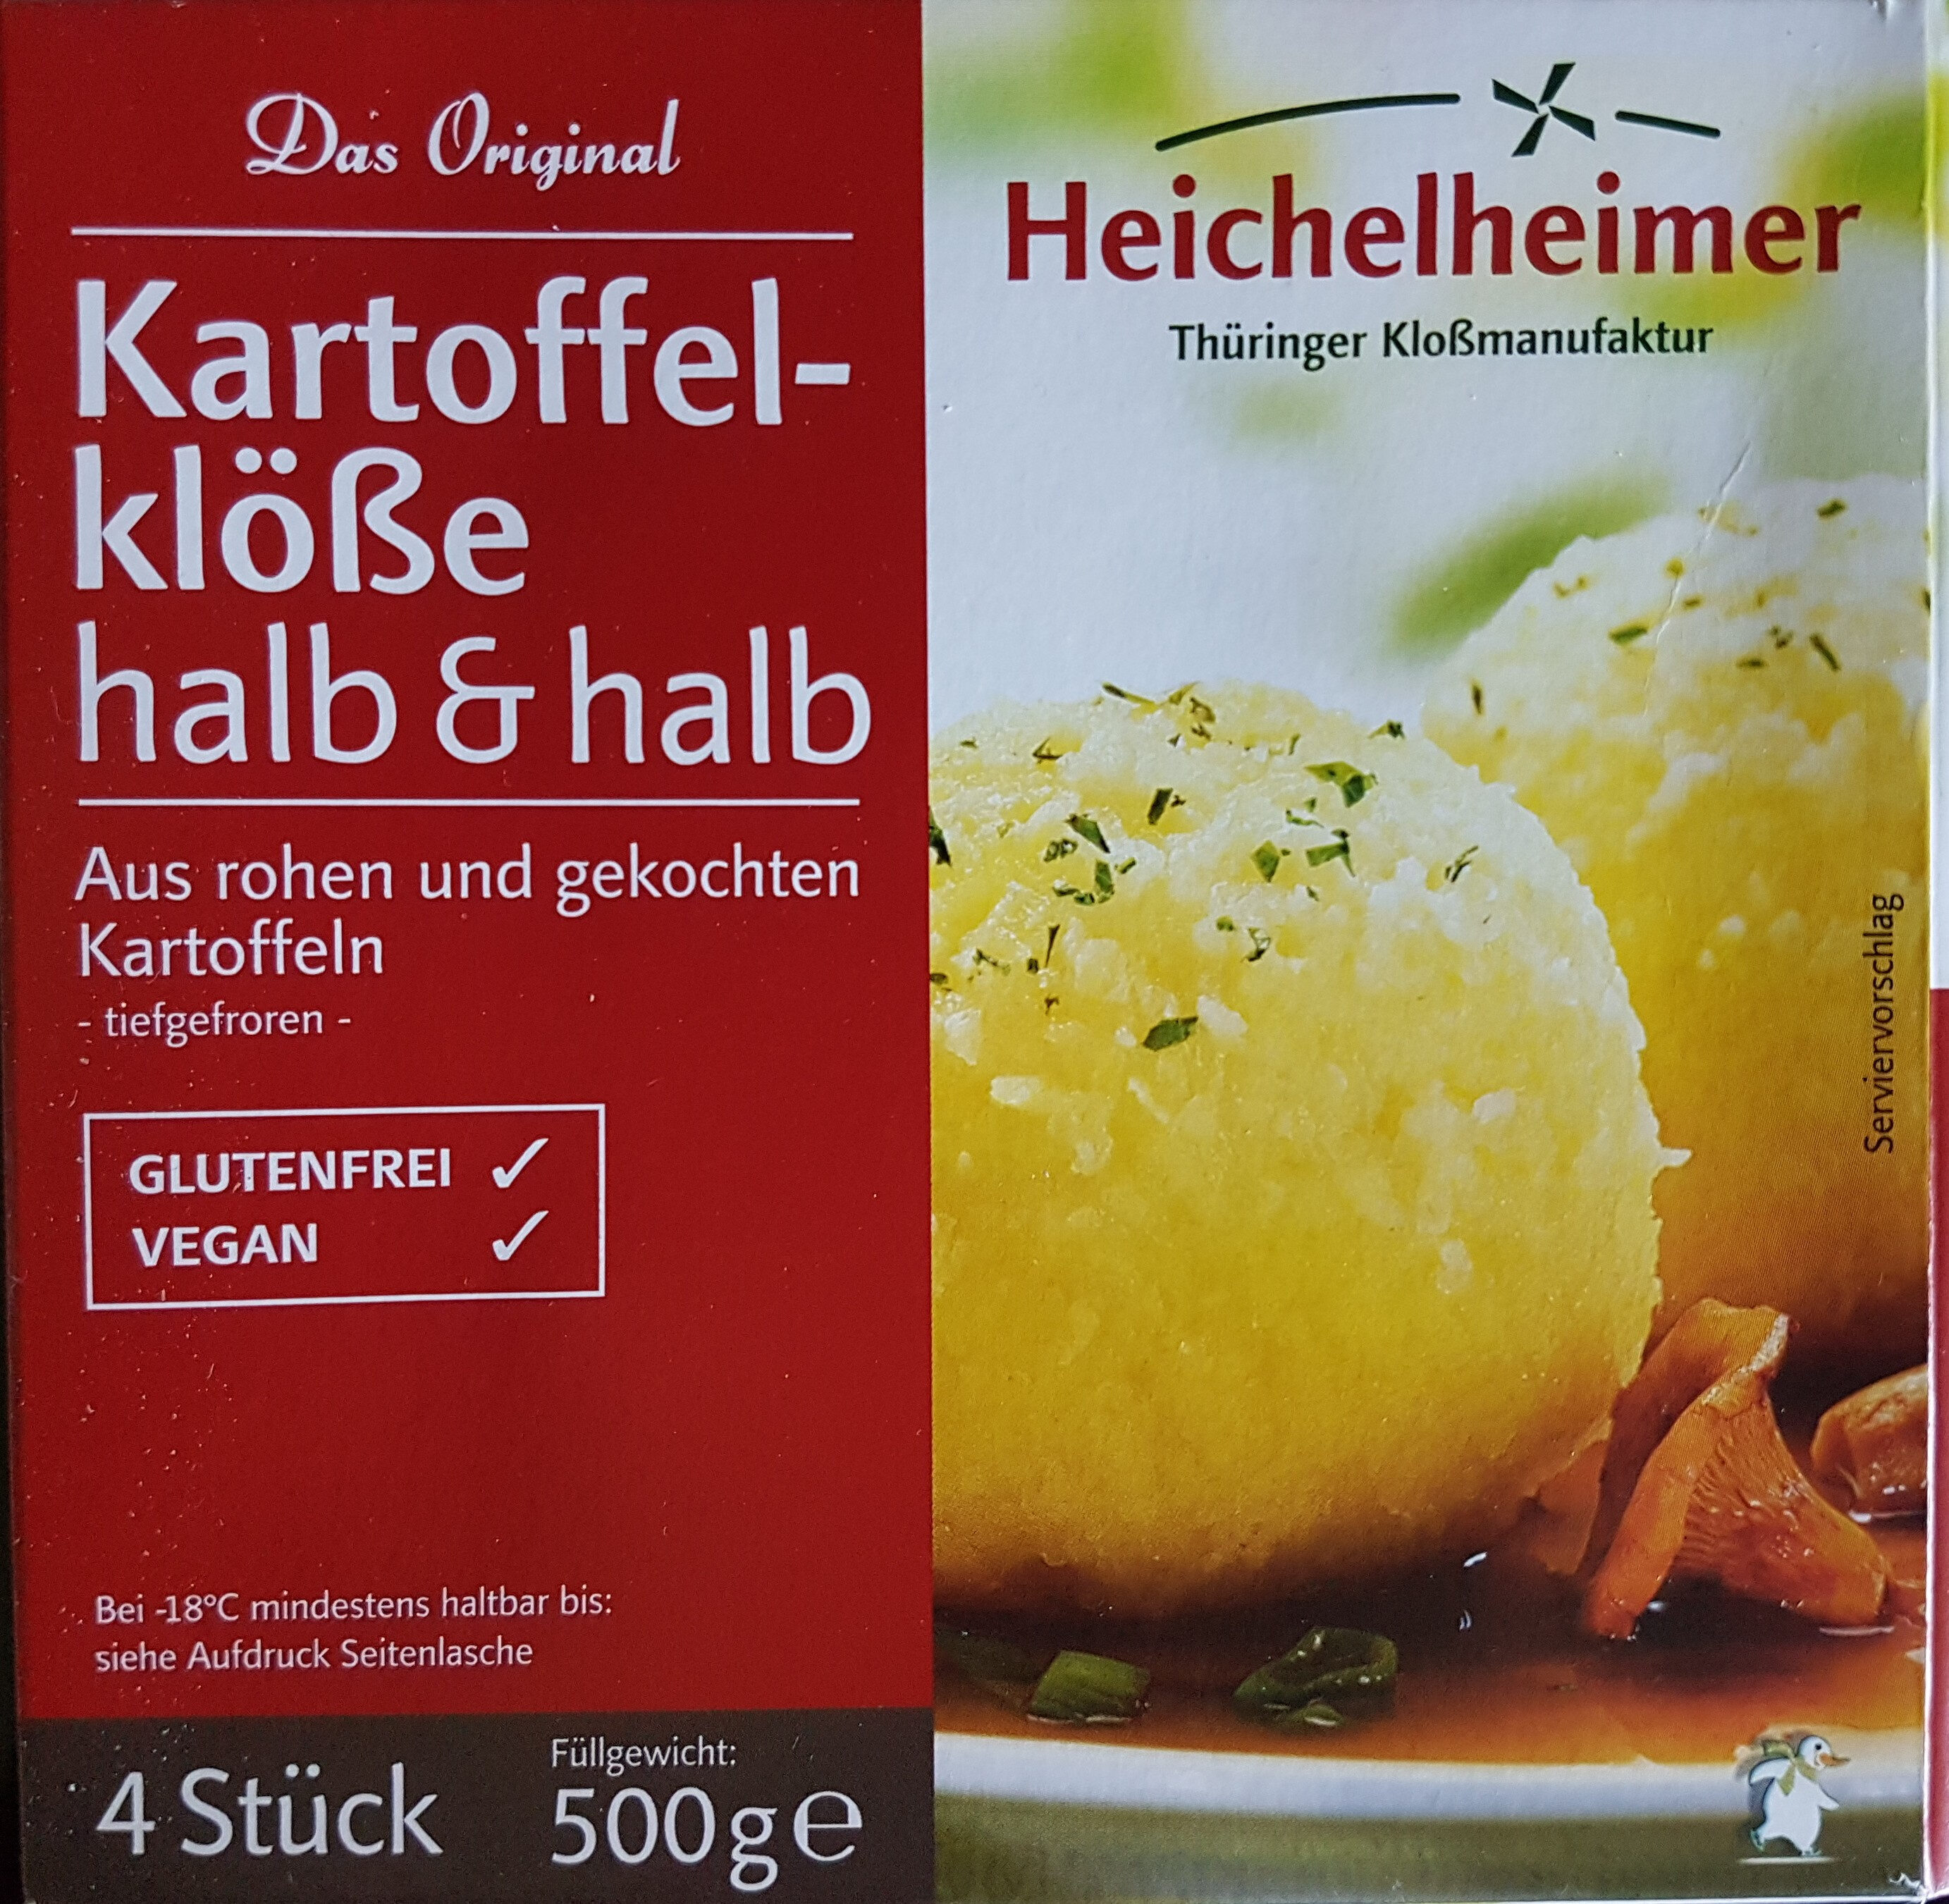 Kartoffelklöße halb & halb - Product - de